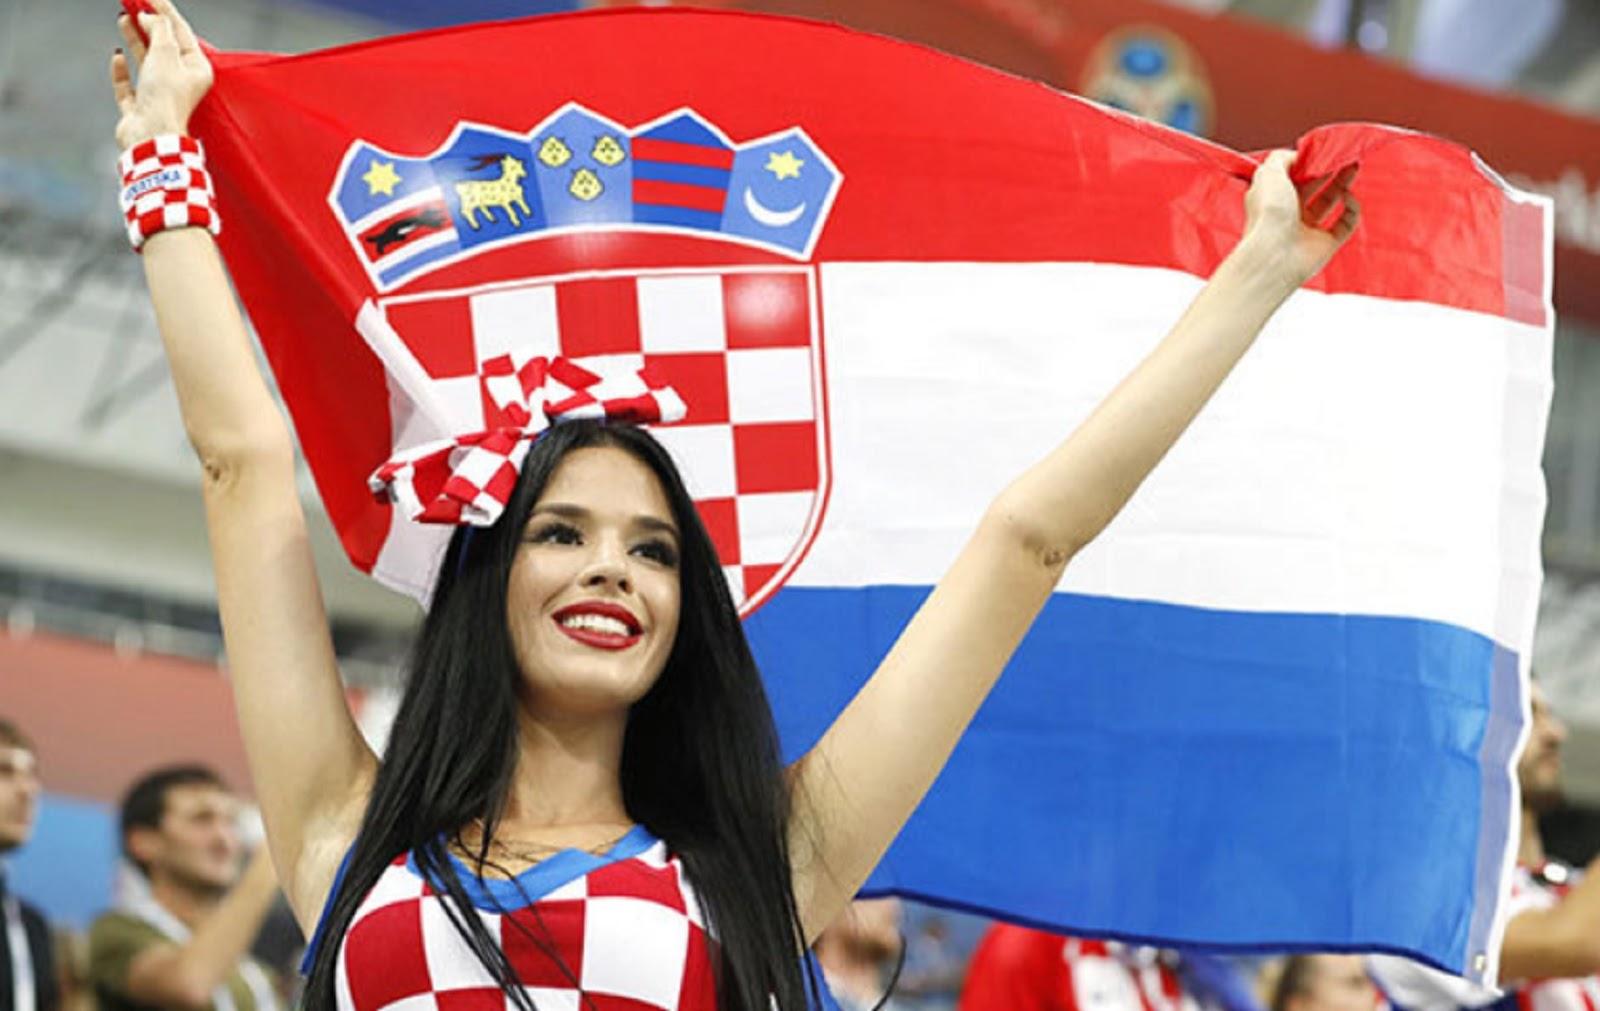 WORLD CUP, CROATIA 3